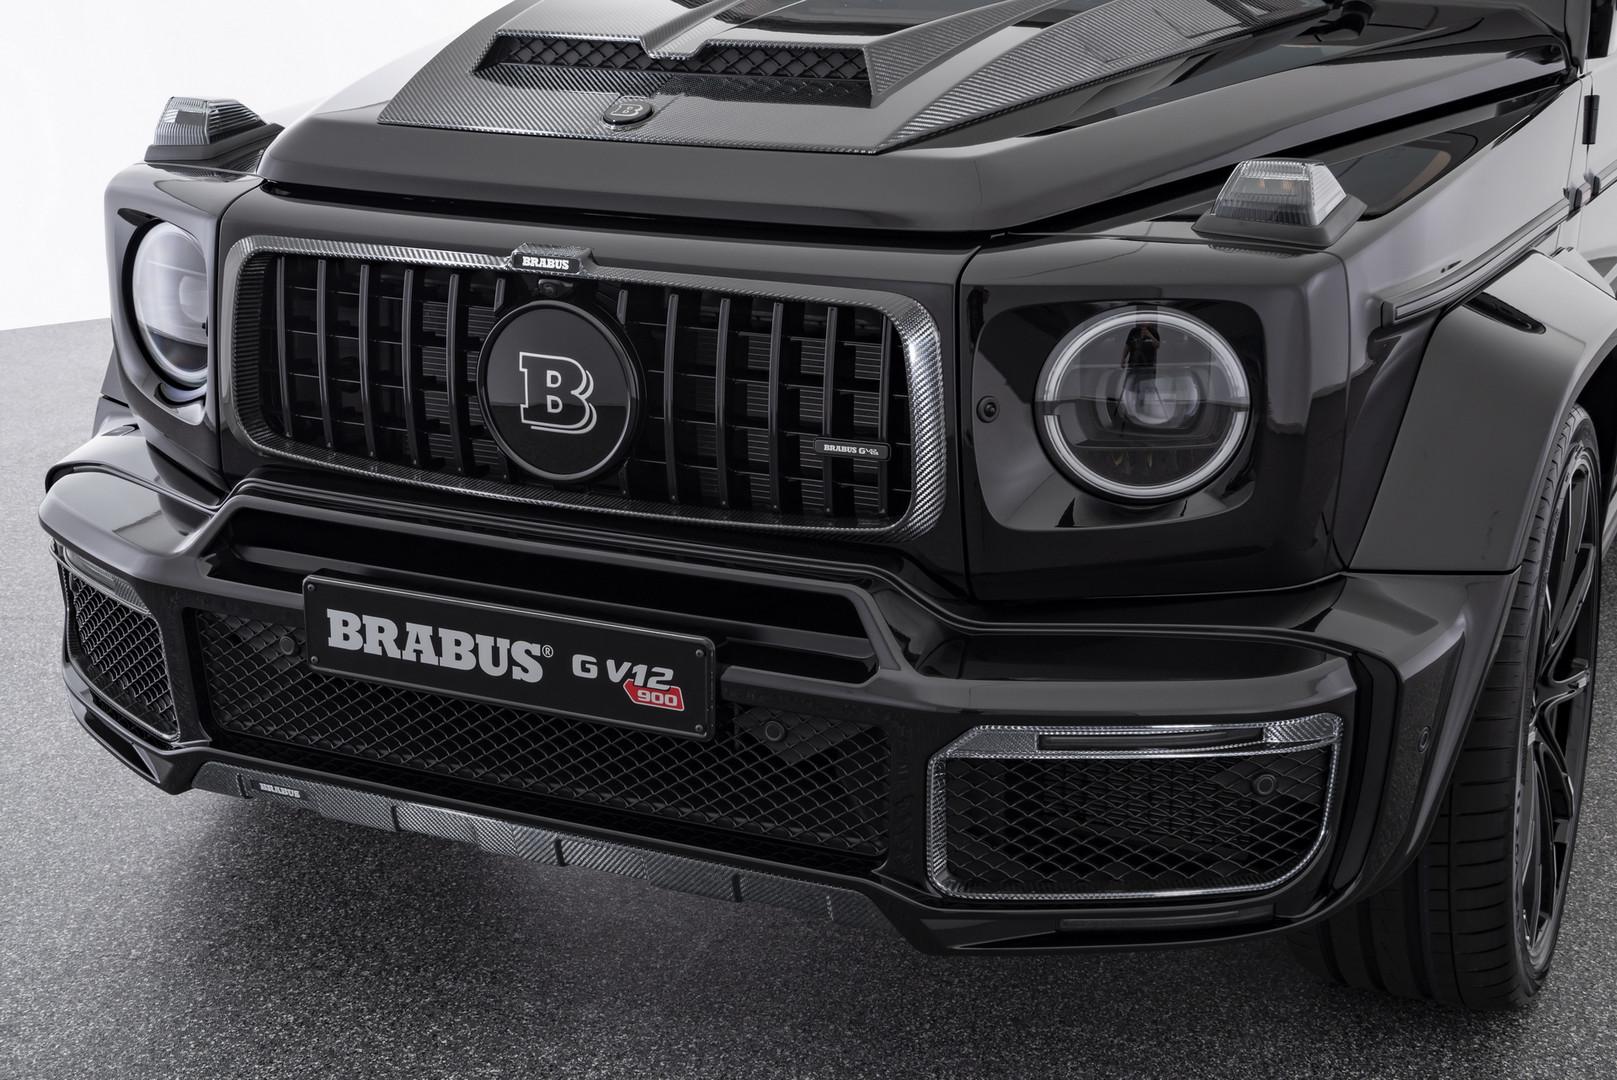 Brabus V12 900 Front Bumper